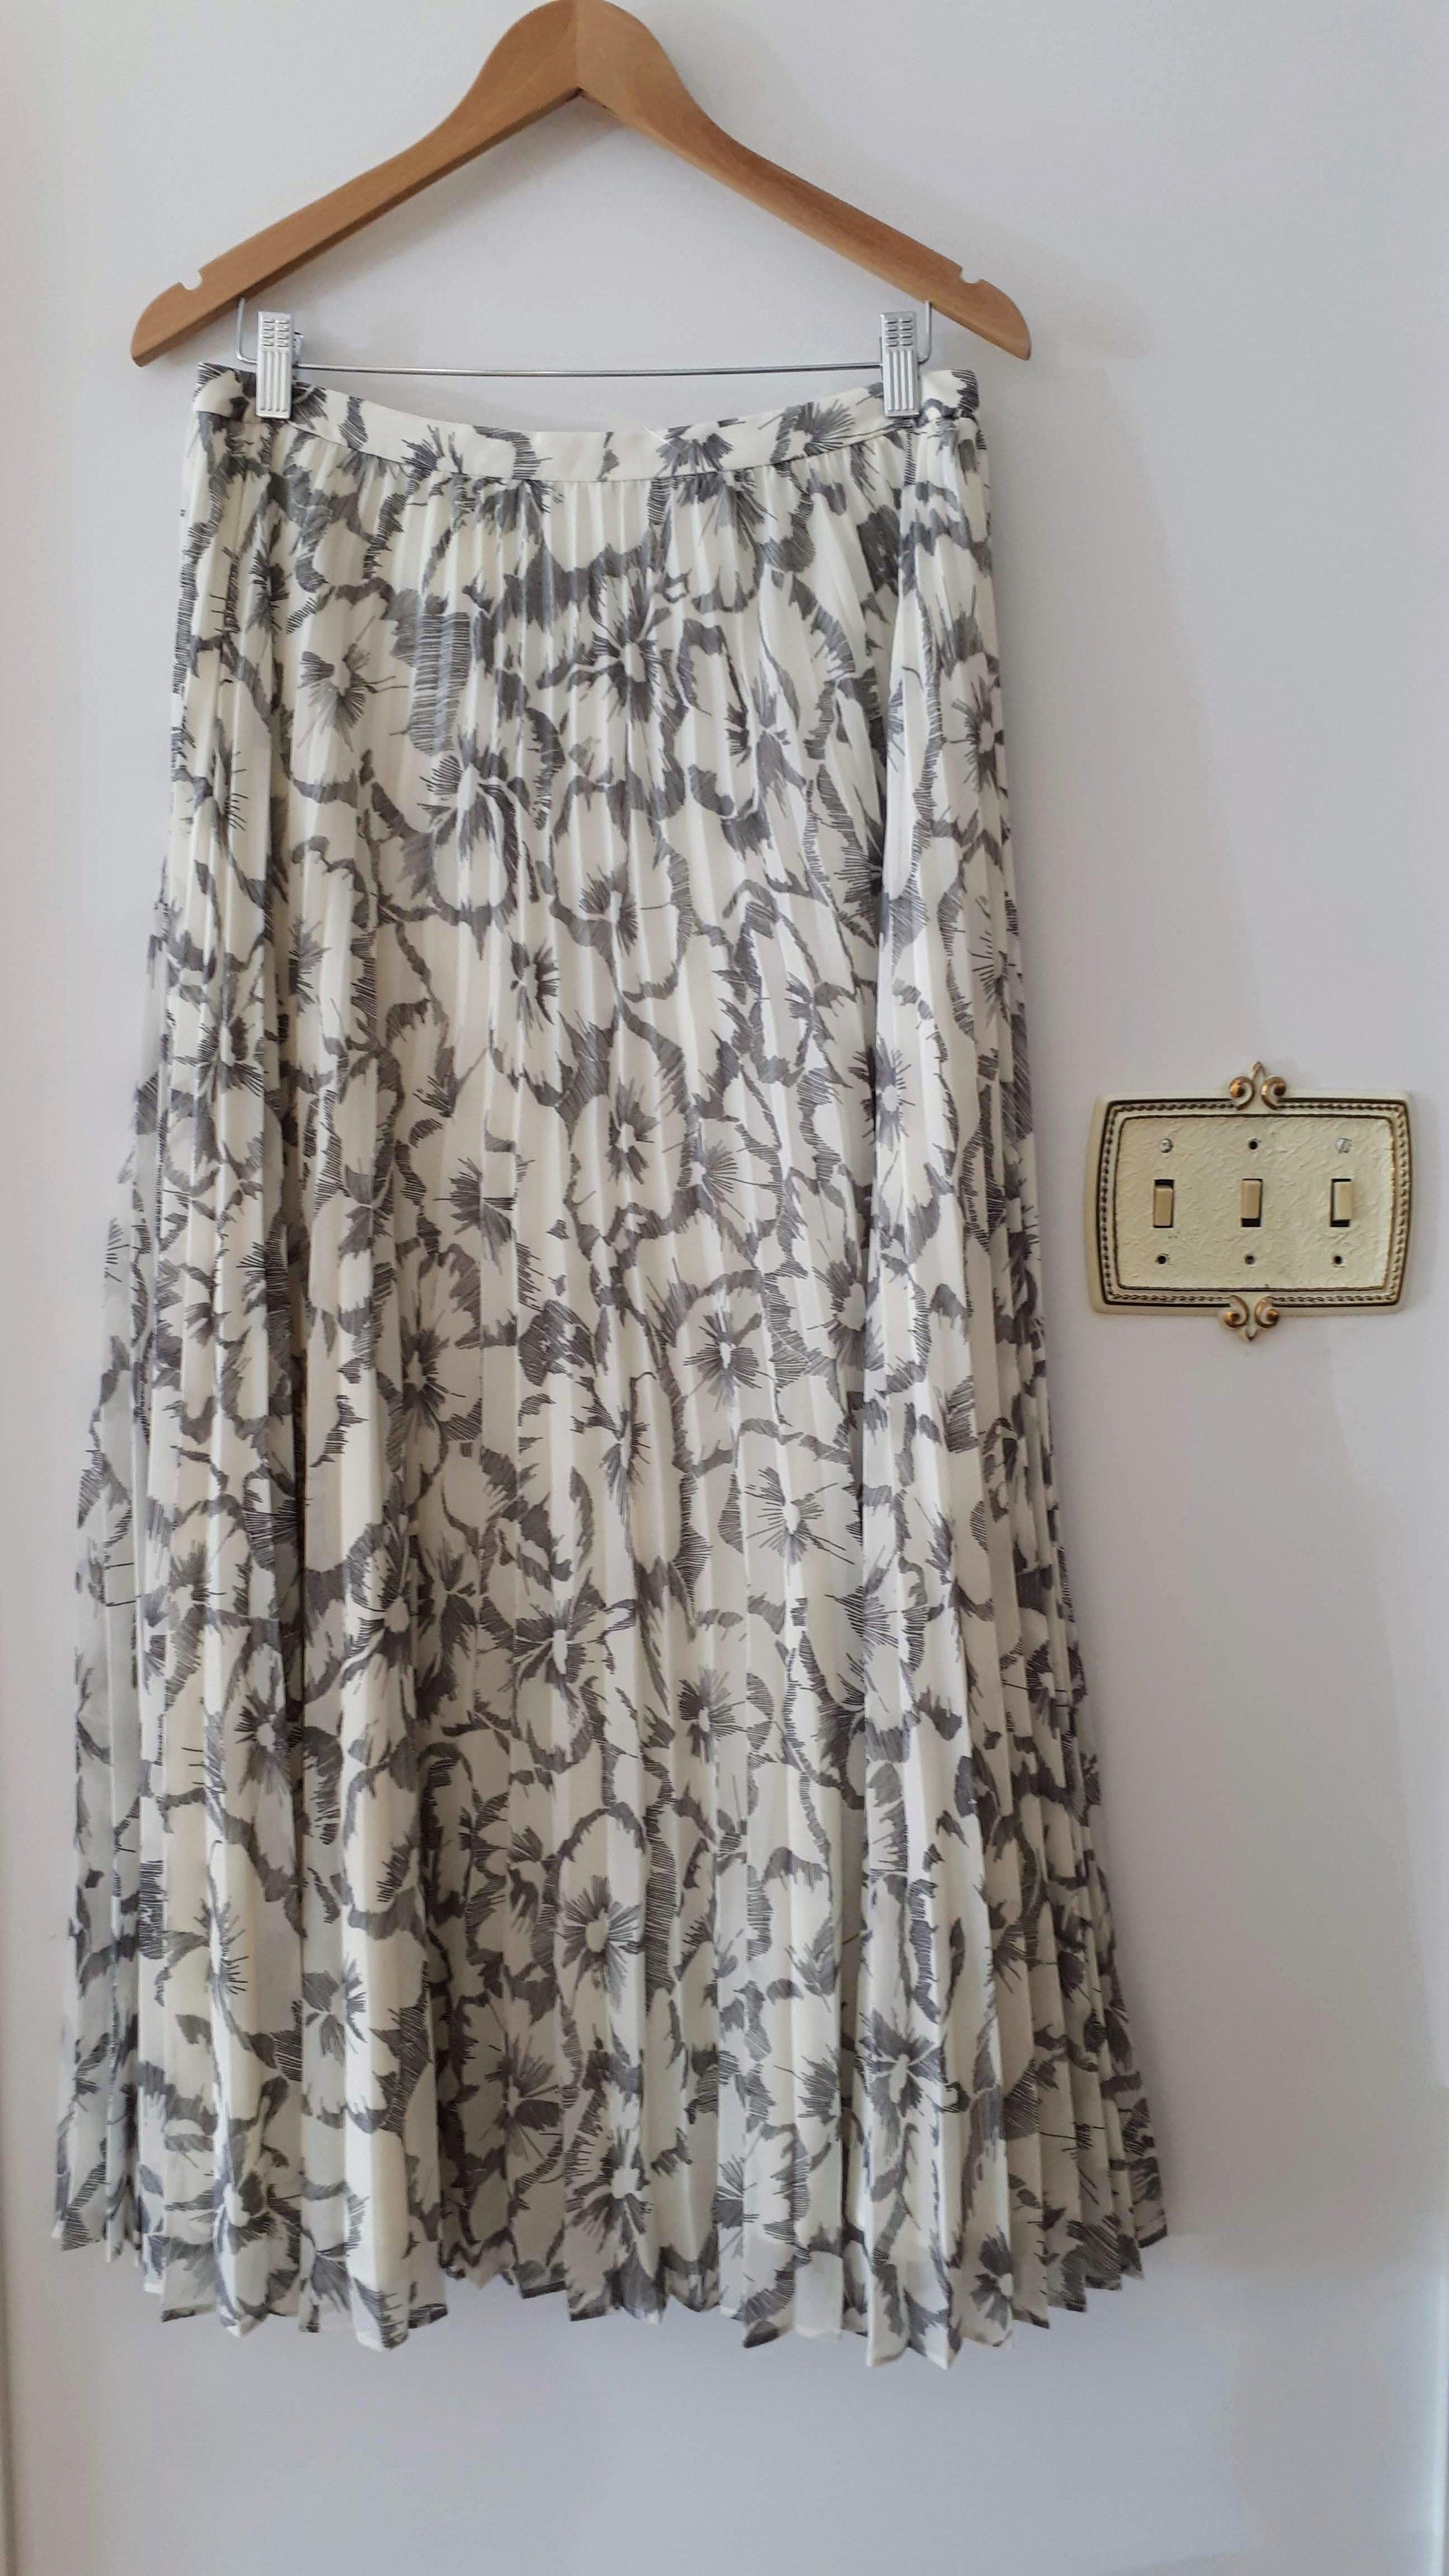 Banana Republic skirt; Size 8, $30